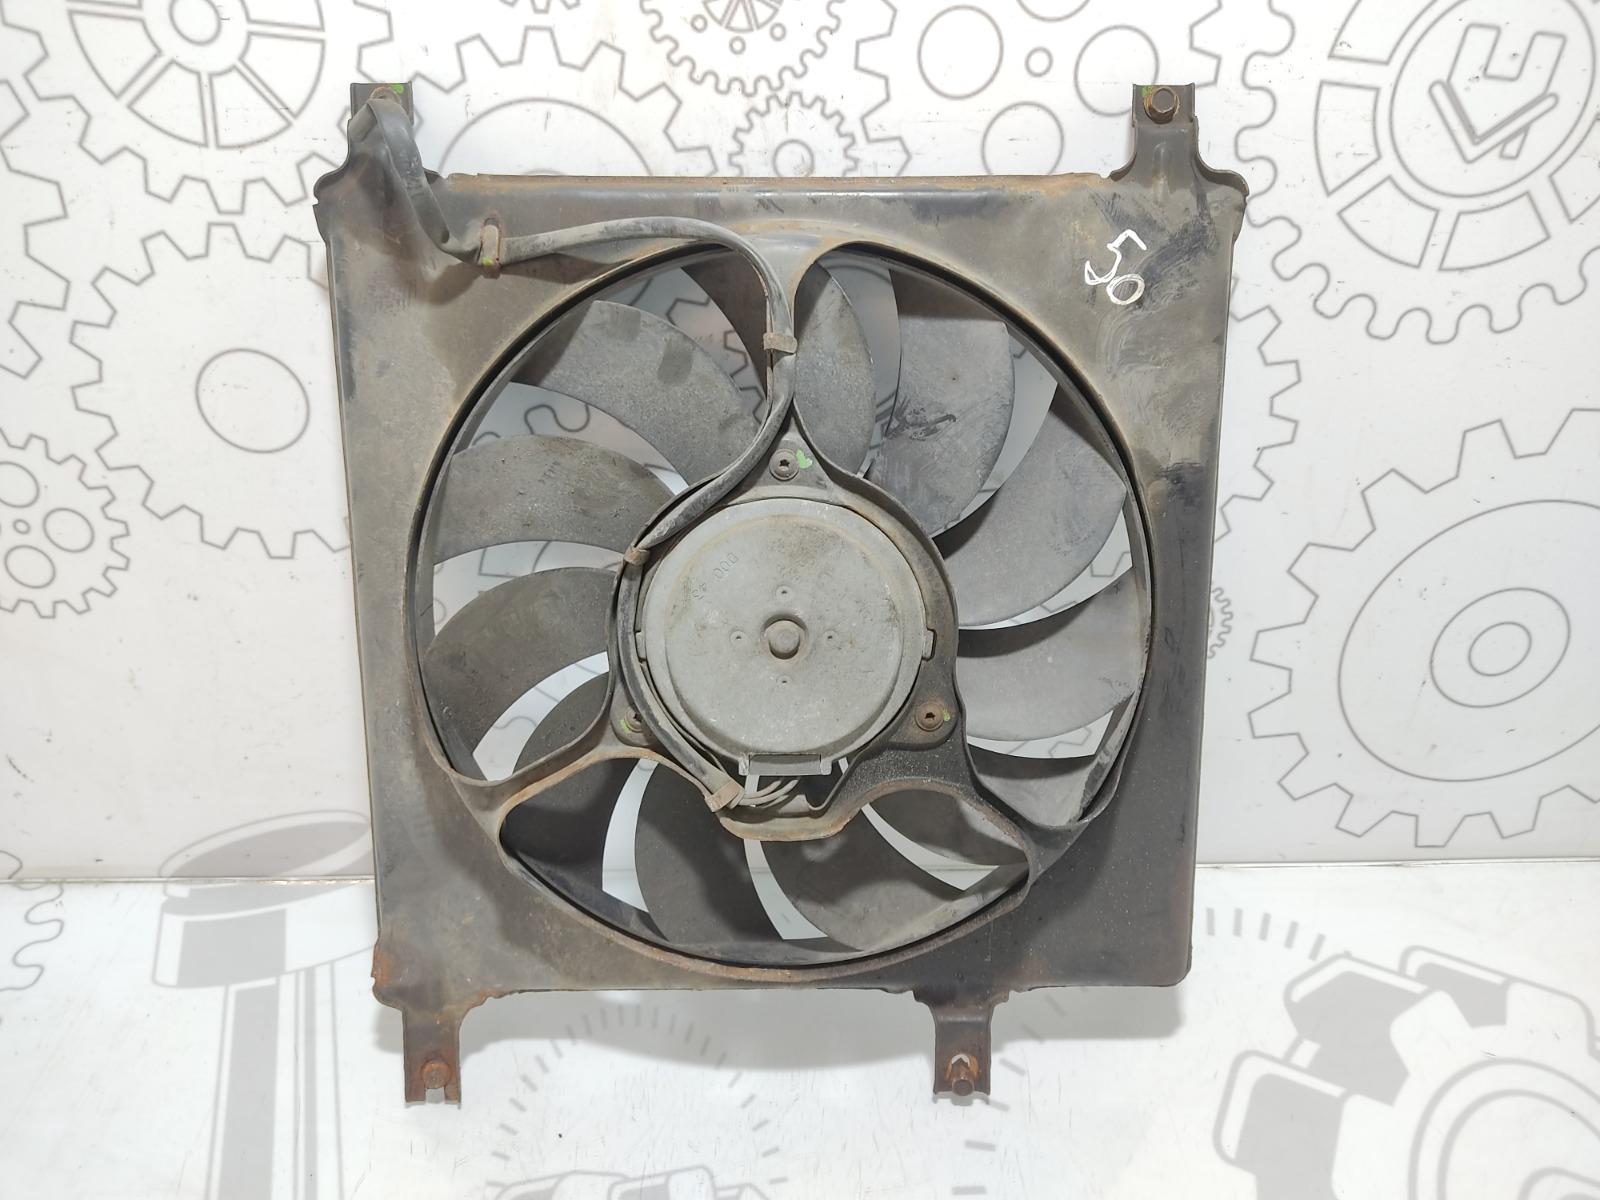 Вентилятор радиатора Suzuki Wagon R 1.3 I 2001 (б/у)